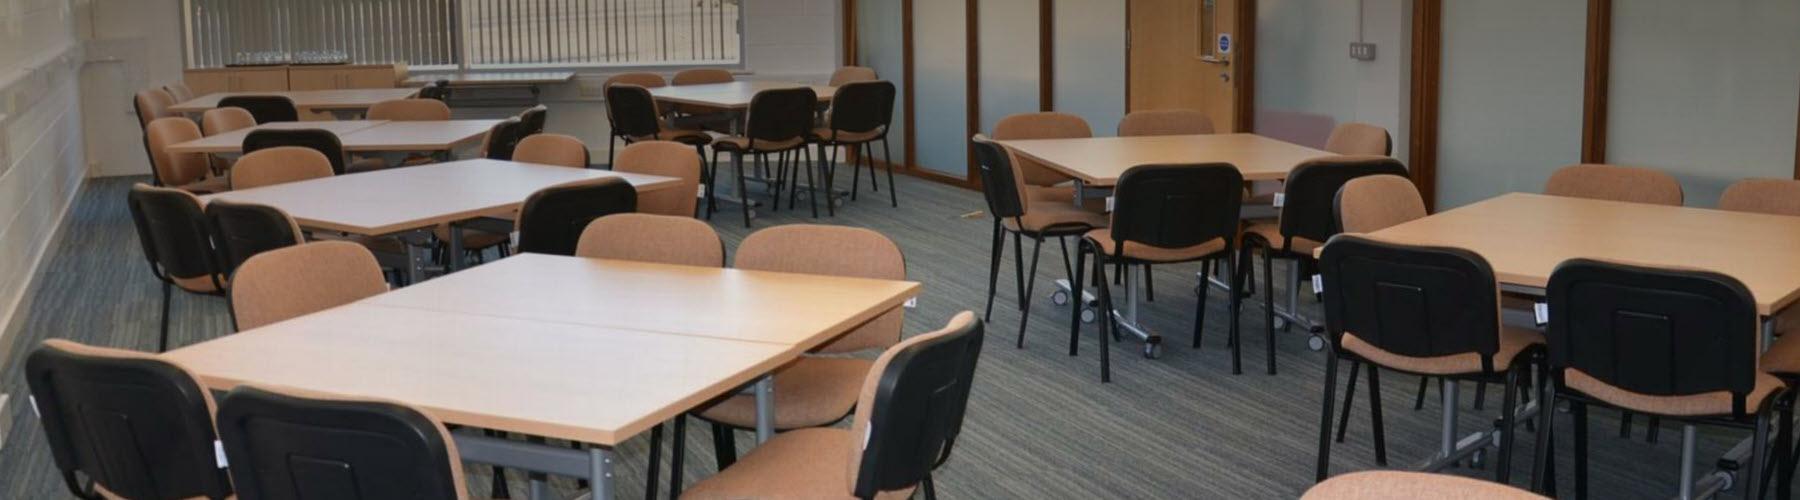 meeting room hire penwortham